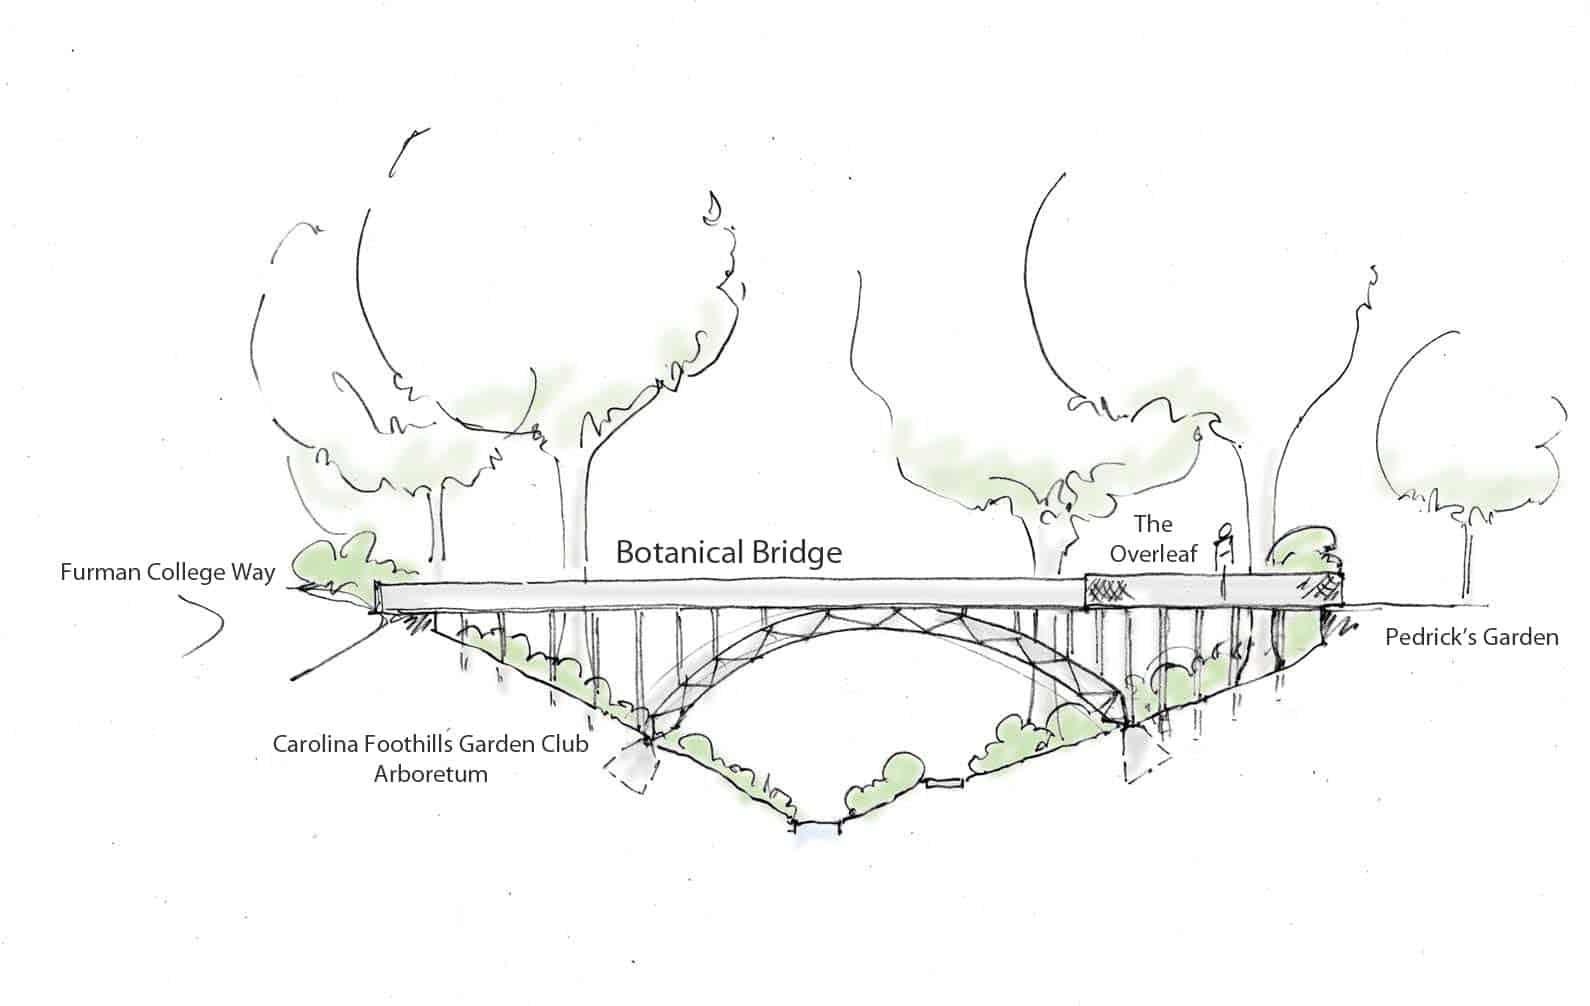 botanical bridge labeled sketch